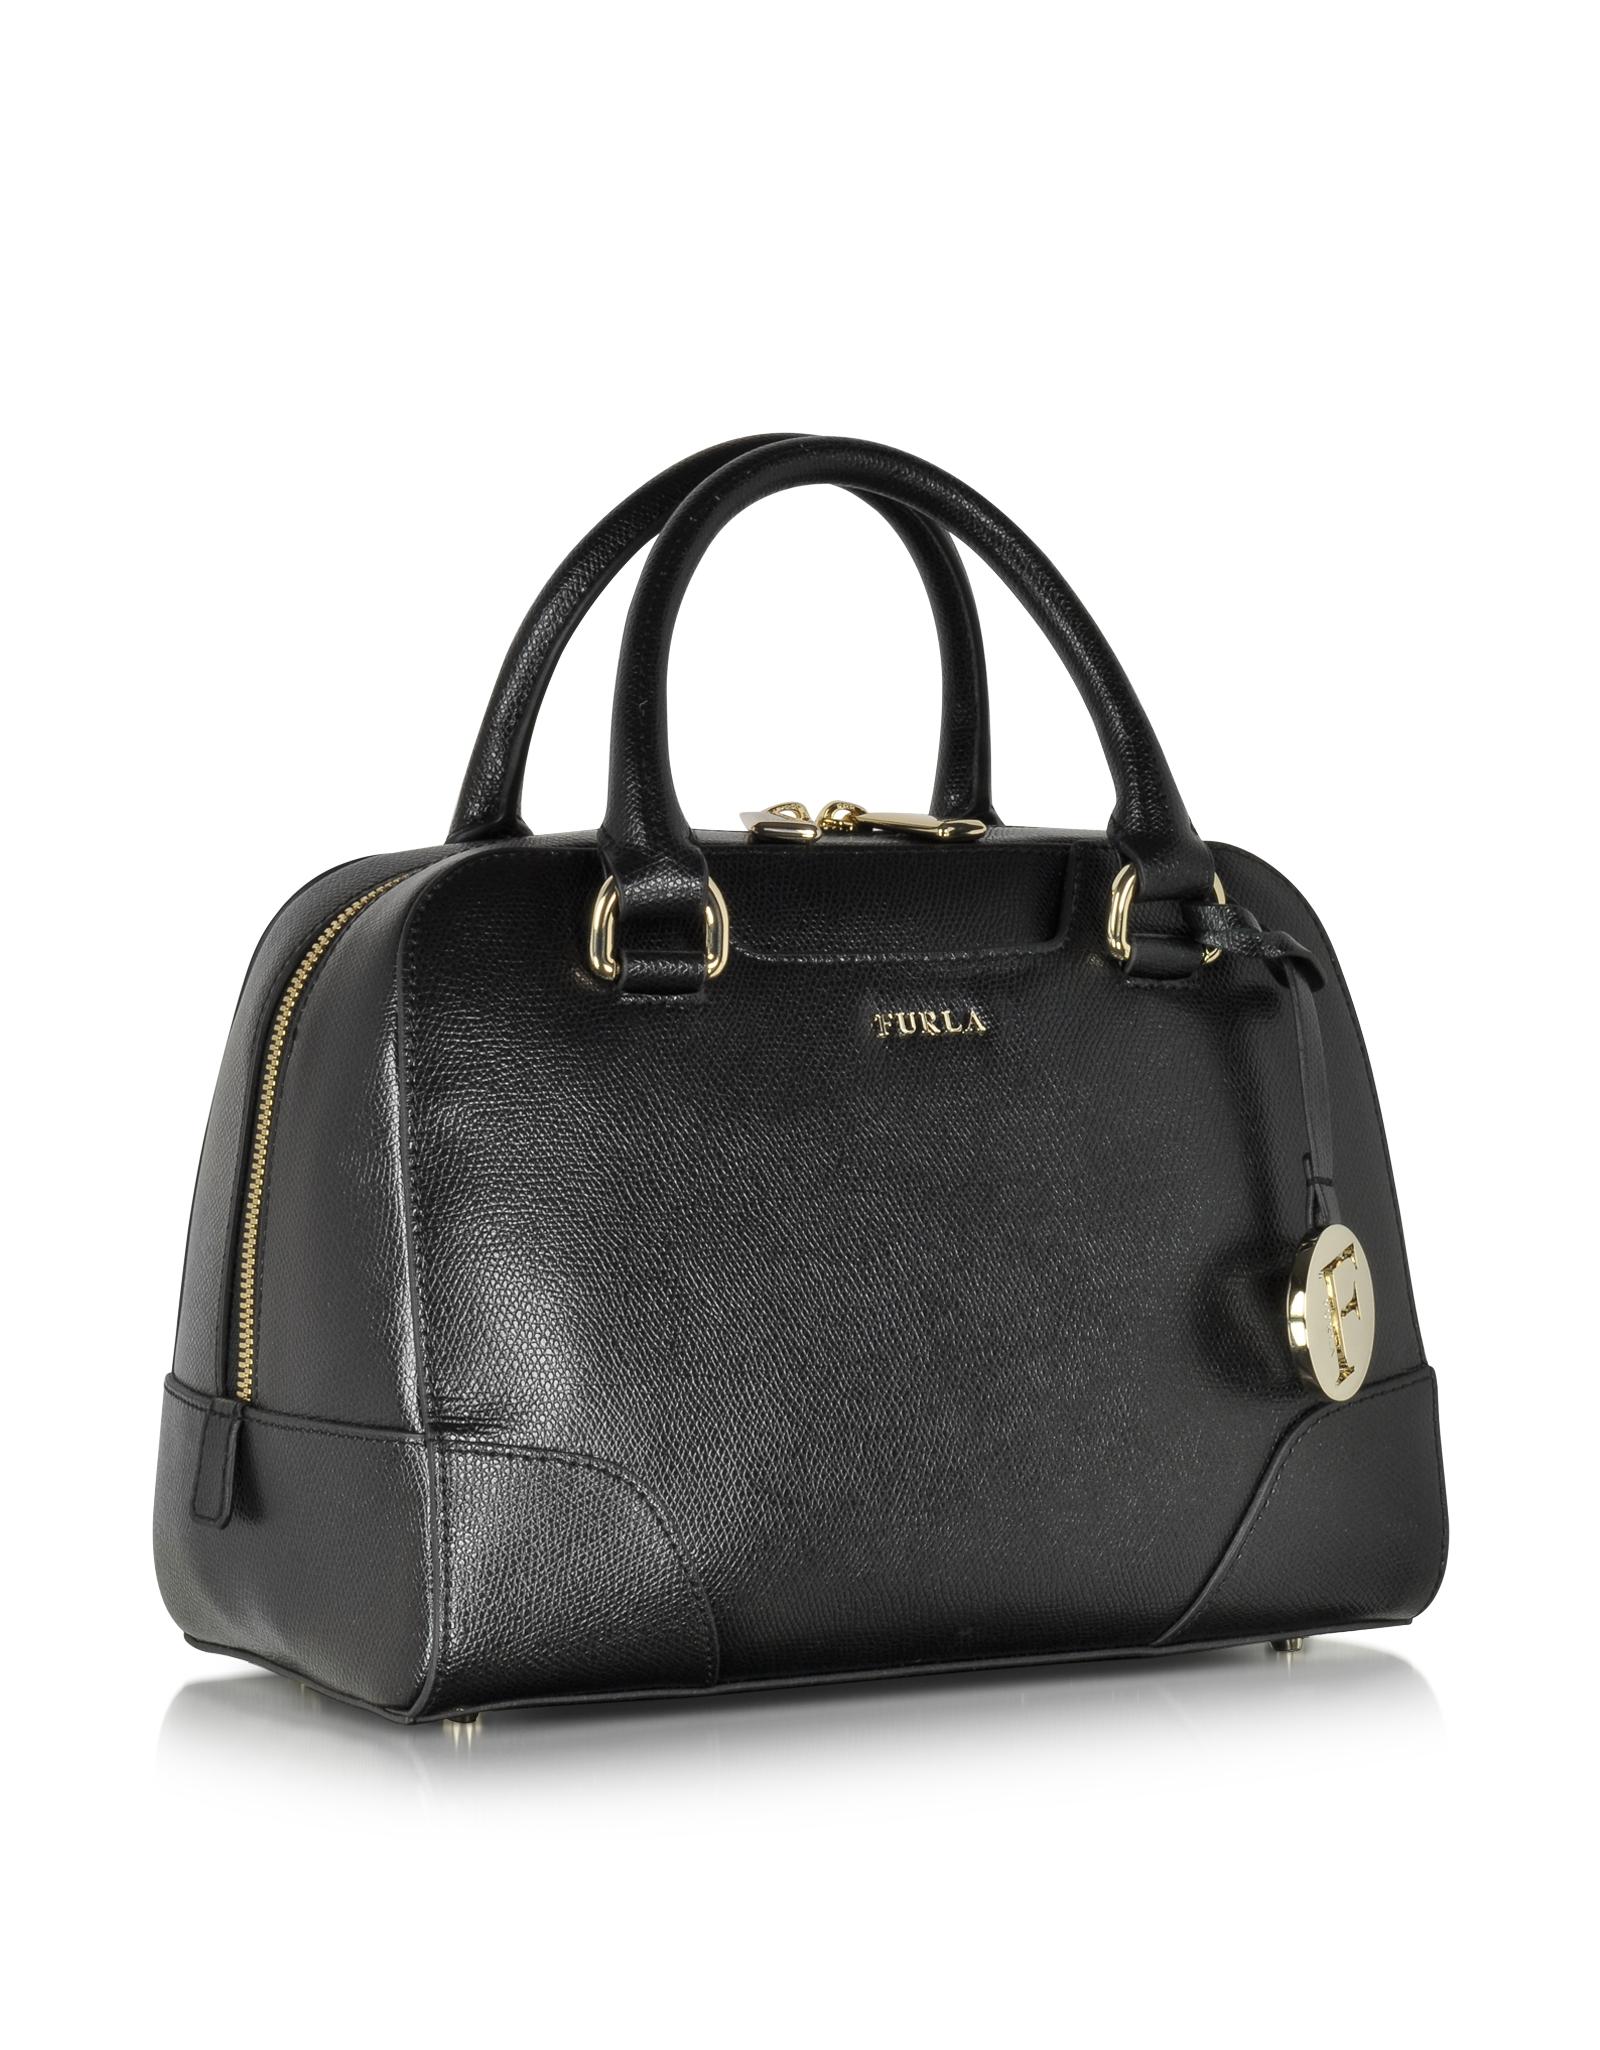 Lyst Furla Dolly Onyx Leather Small Satchel In Black